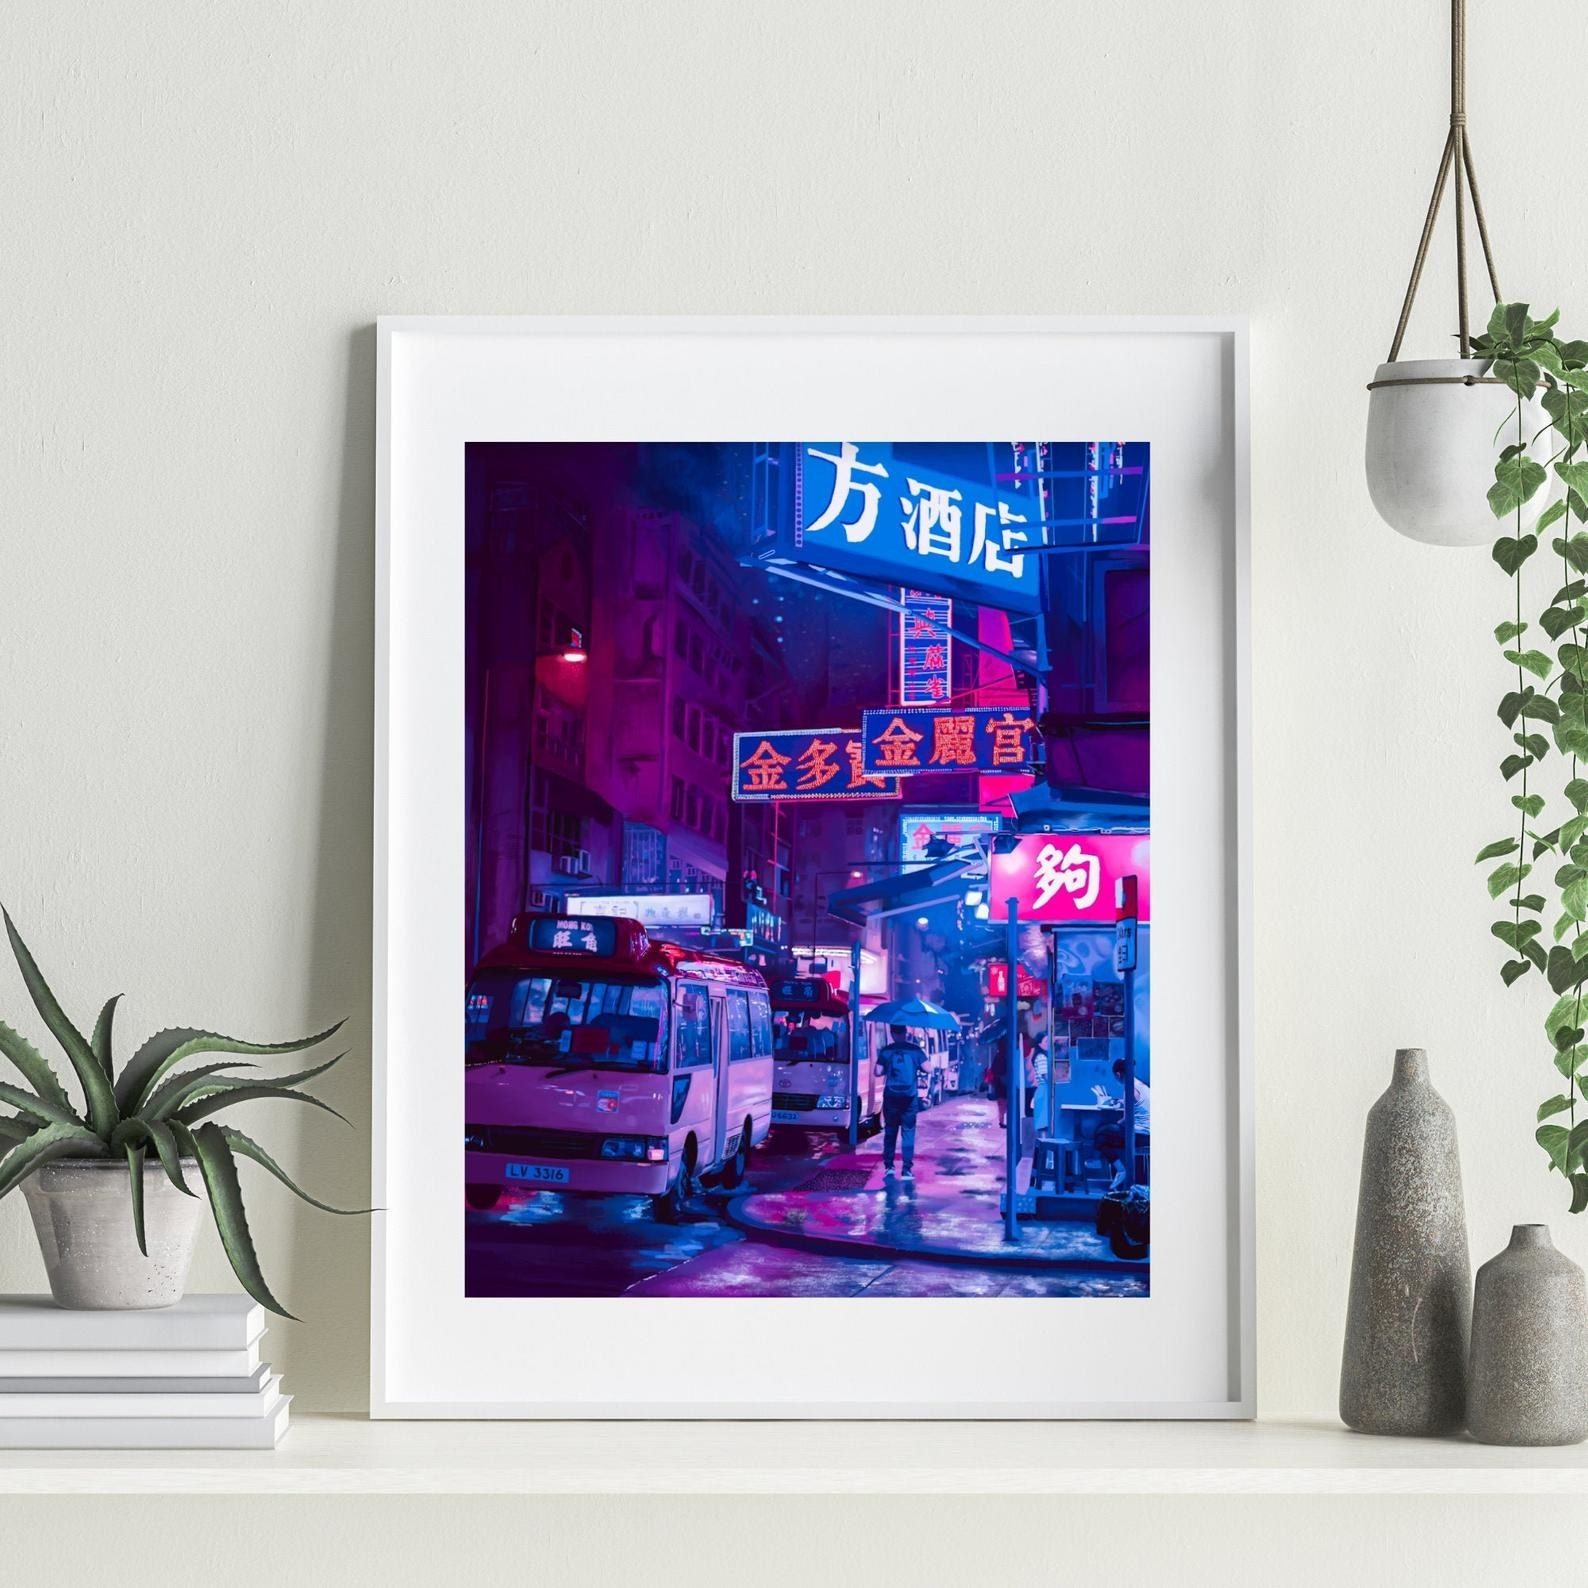 the print in a frame on a shelf